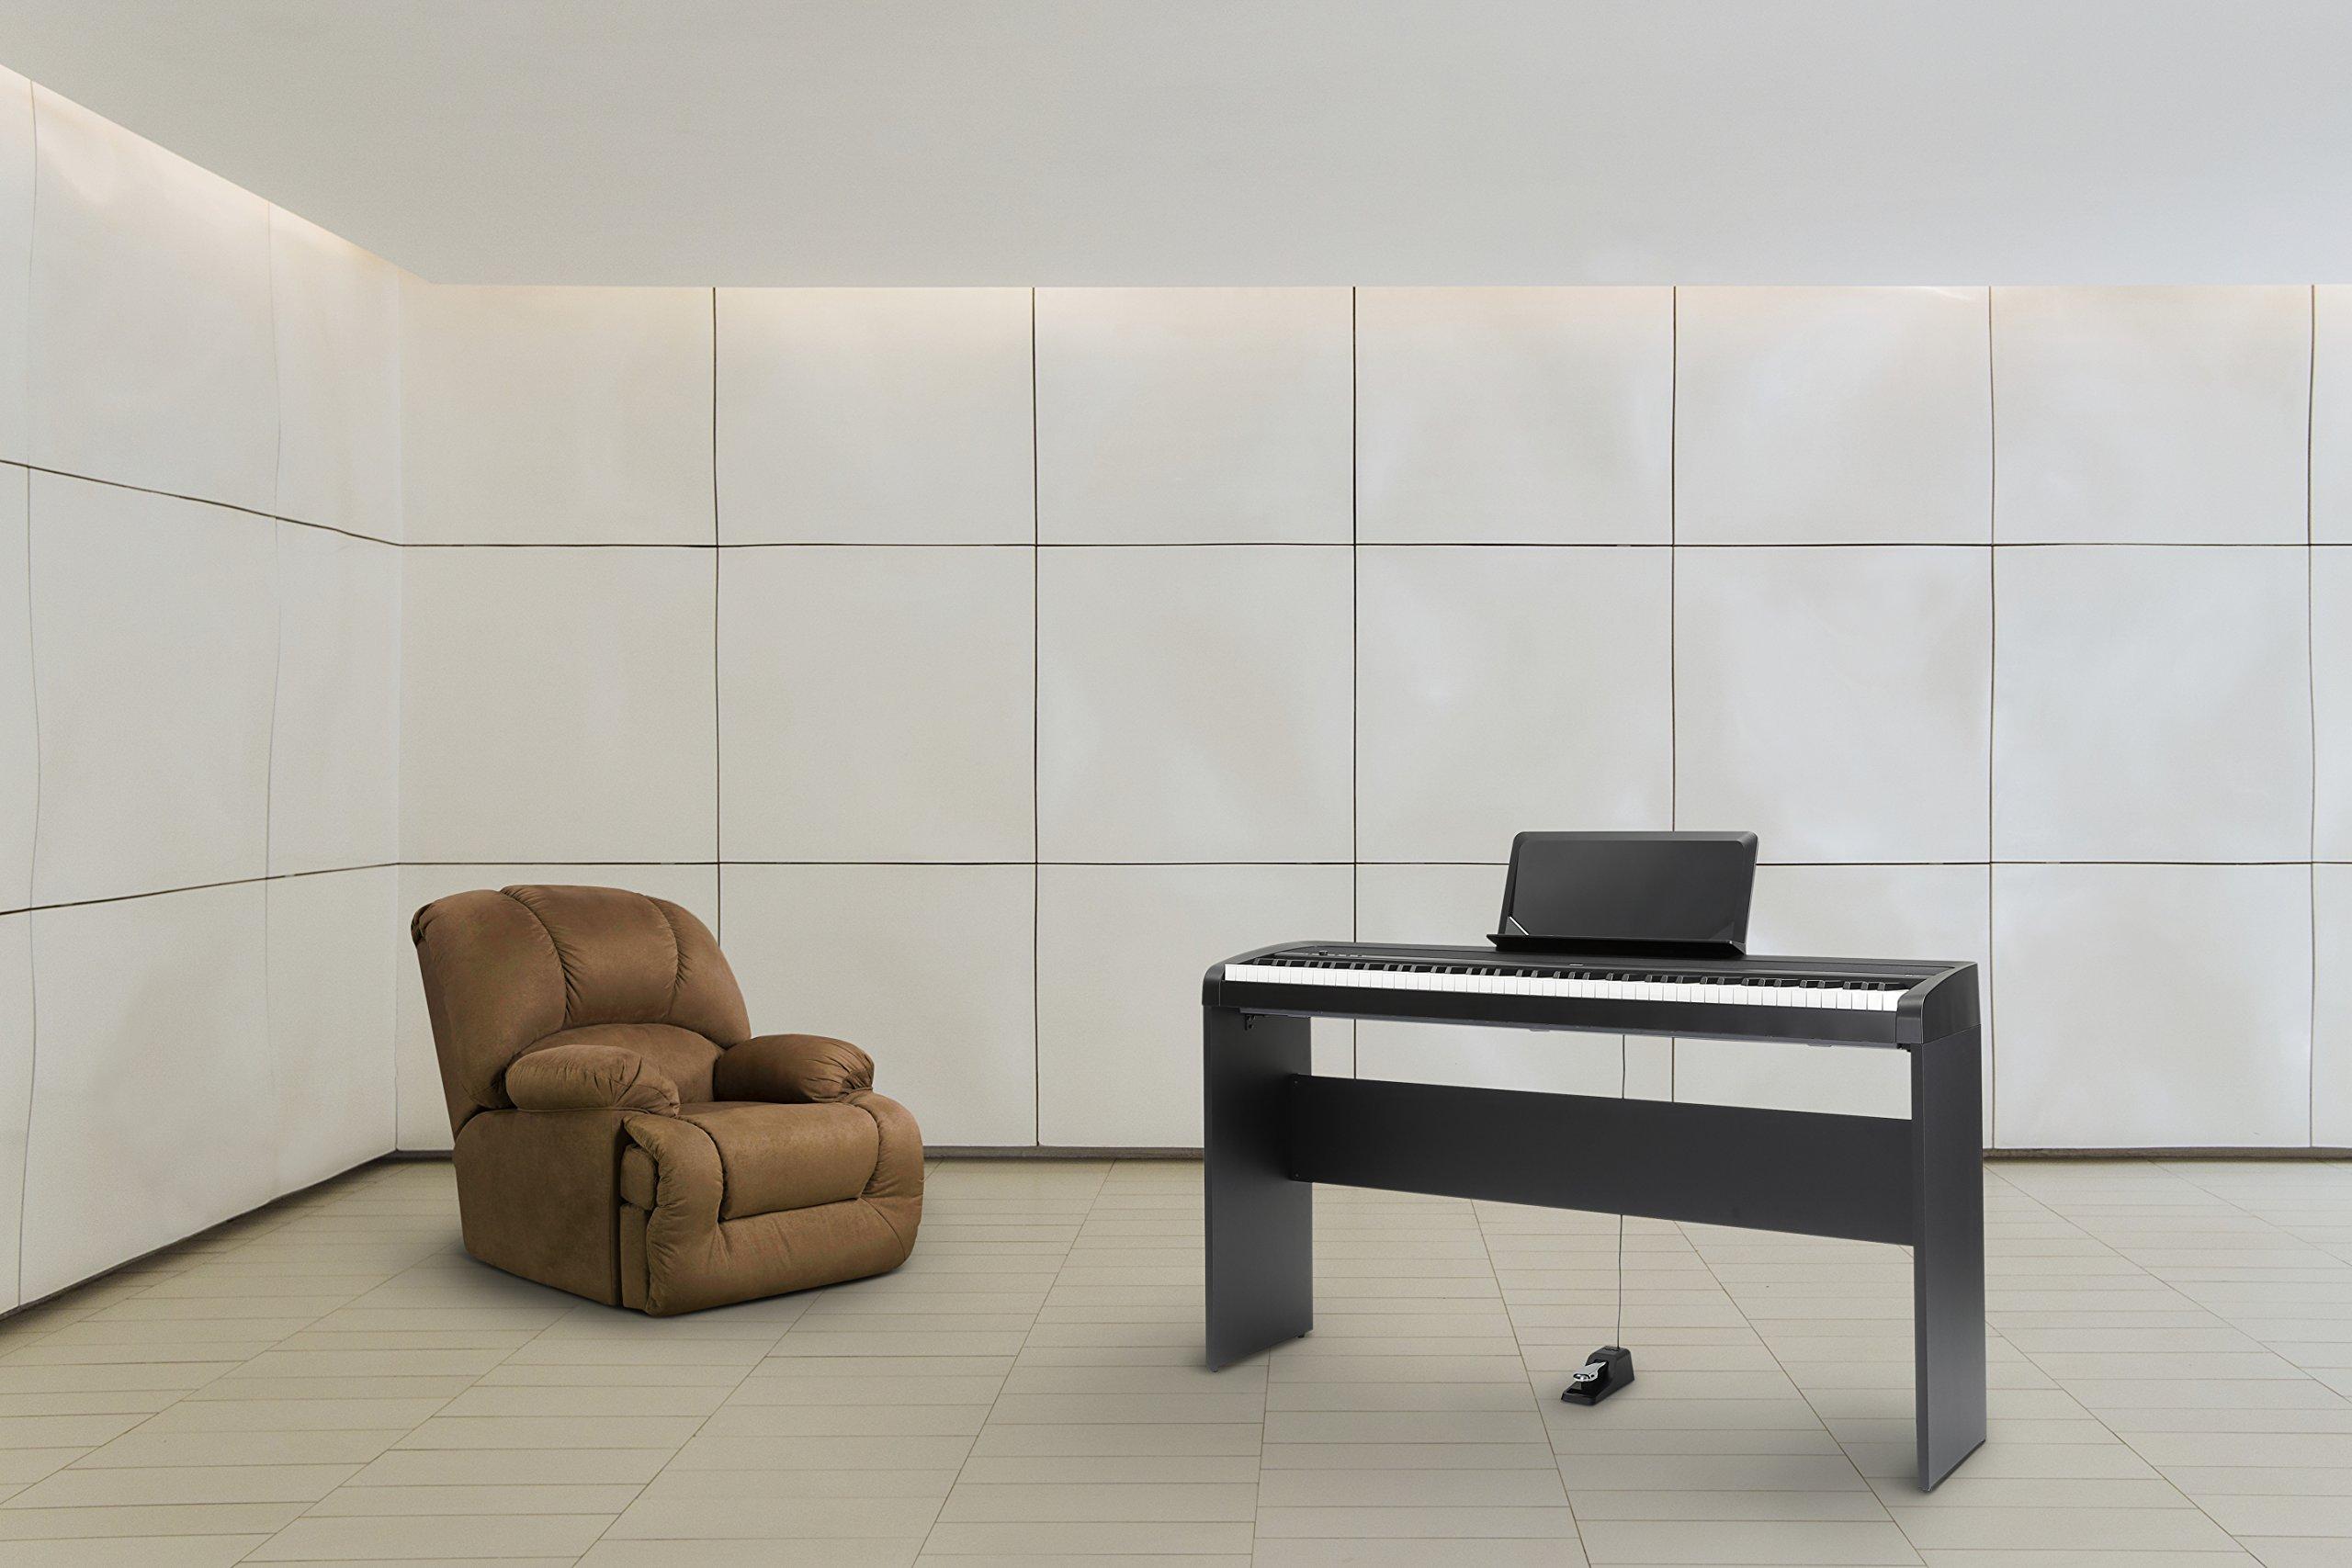 Korg B1 88 Key Digital Piano with Enhanced Speaker System Black by Korg (Image #4)